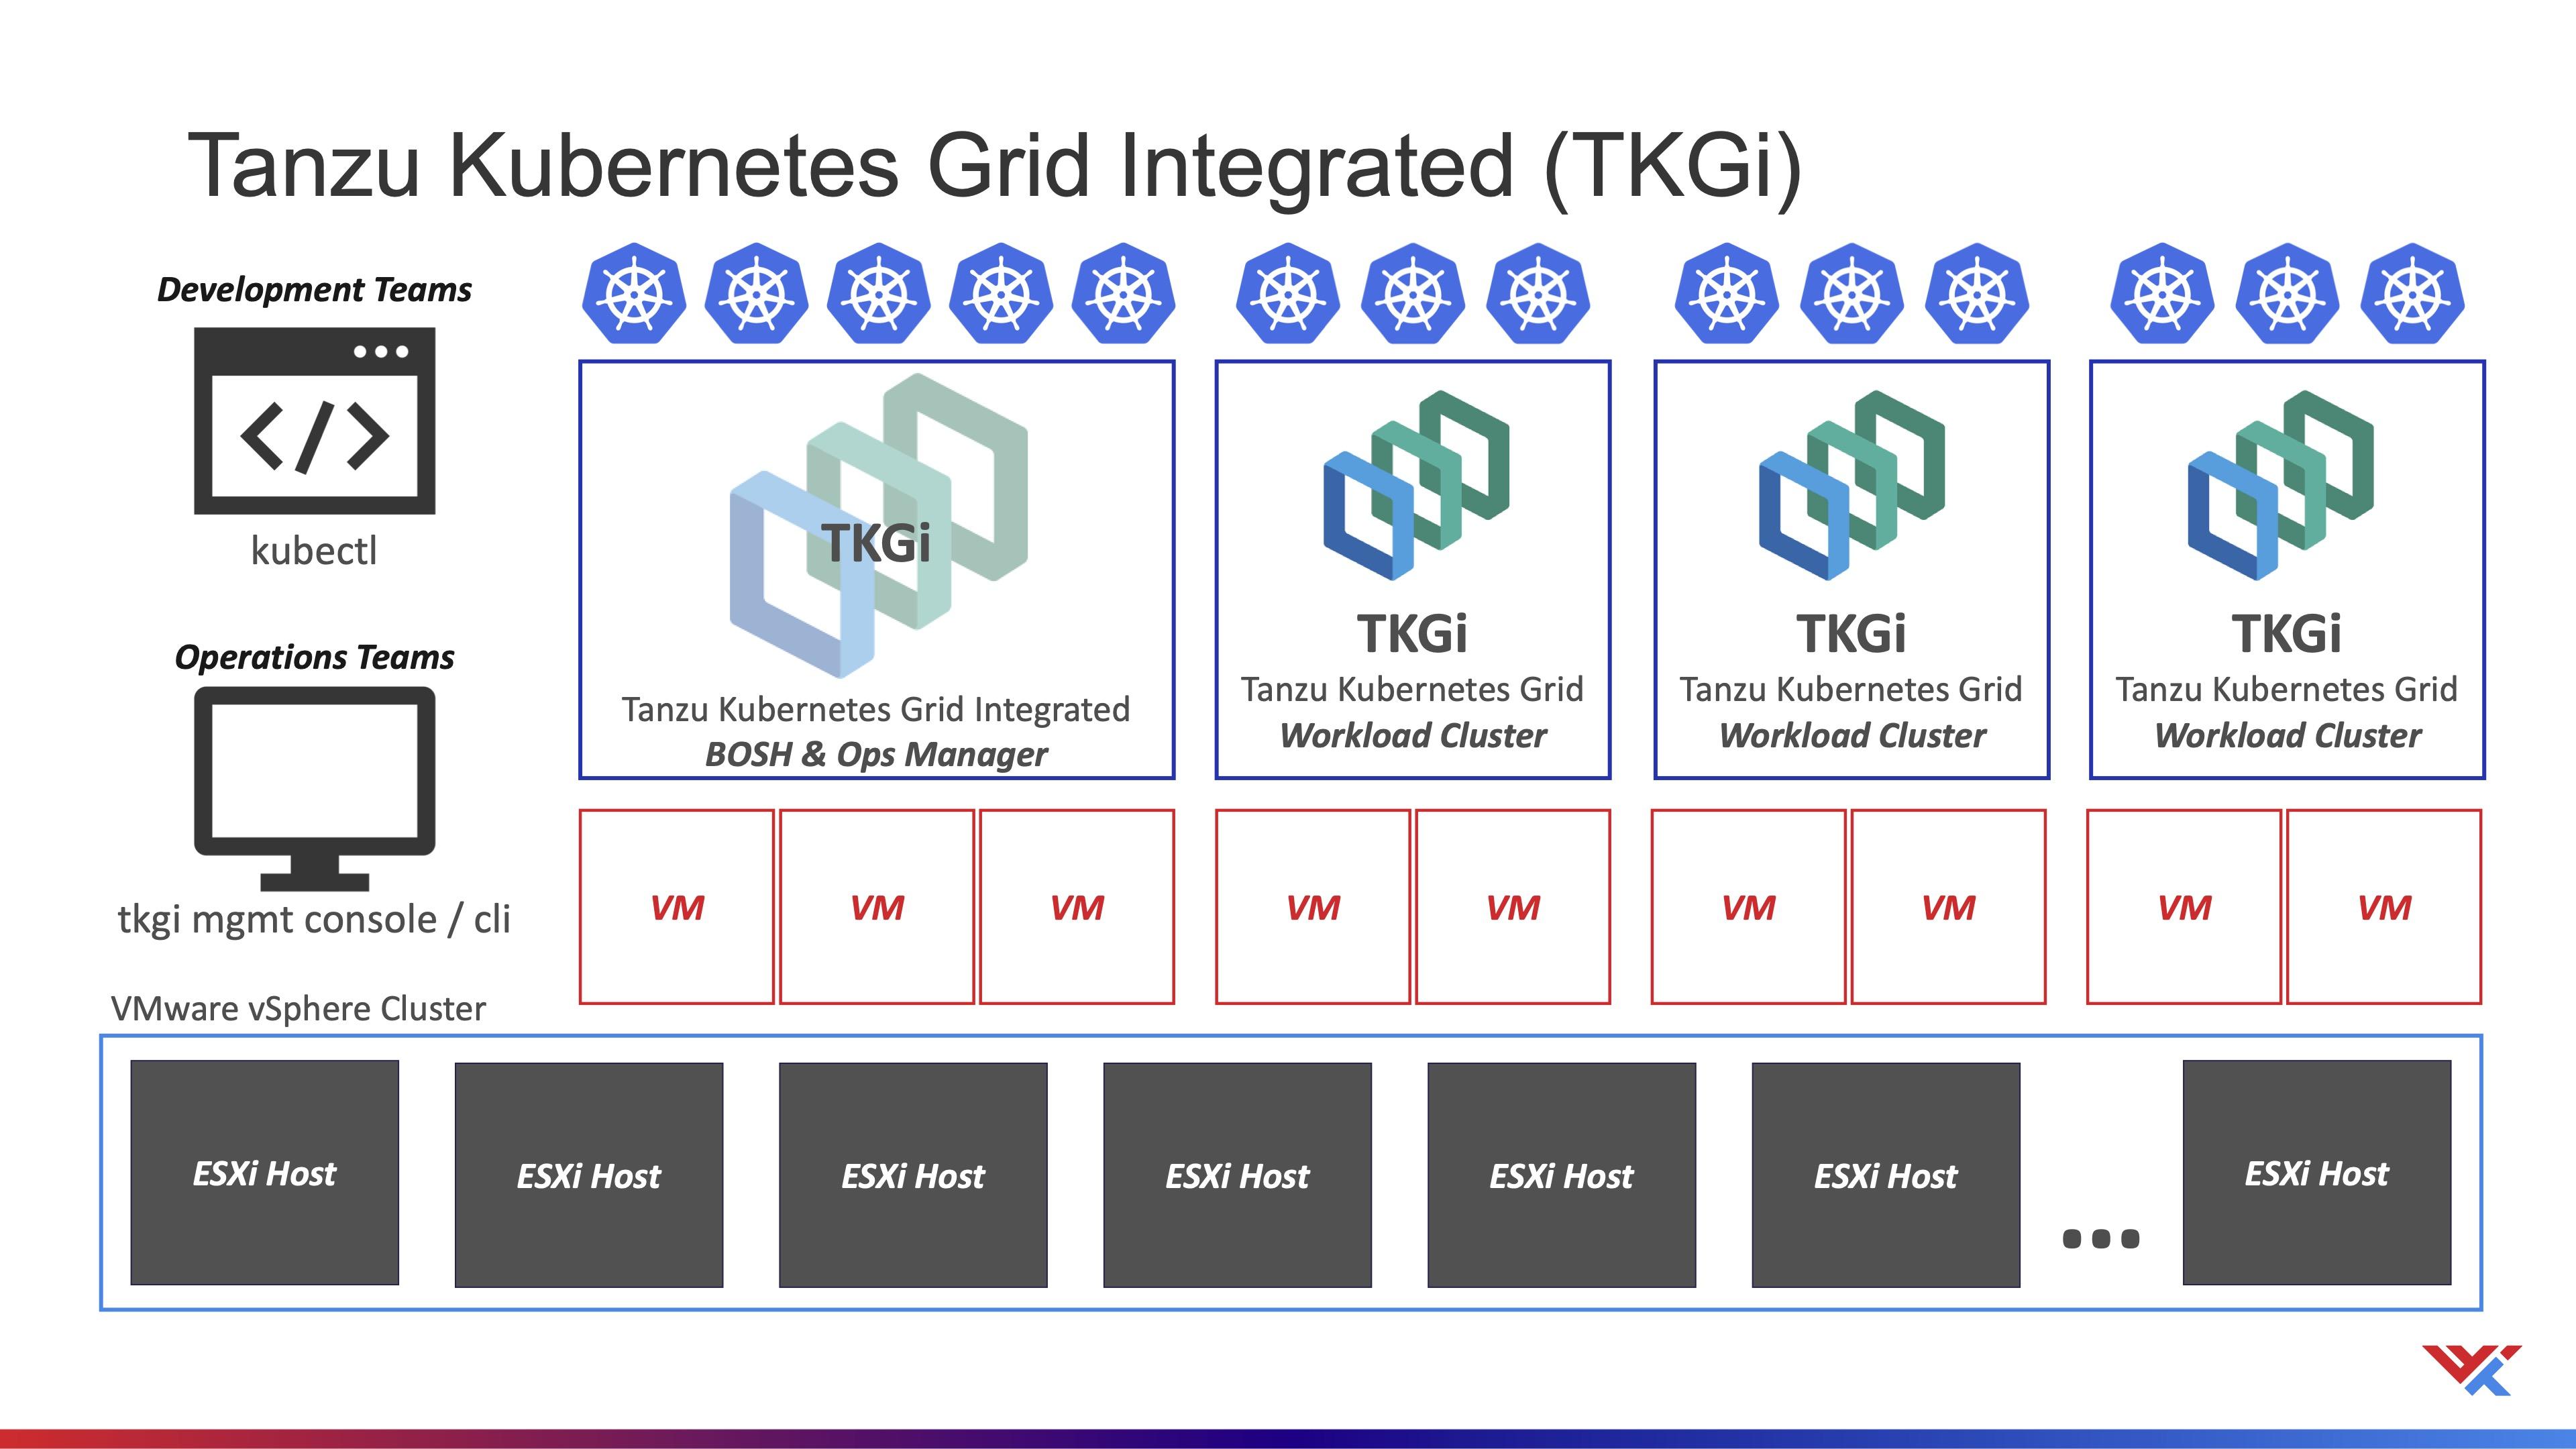 Tanzu Kubernetes Grid Integrated